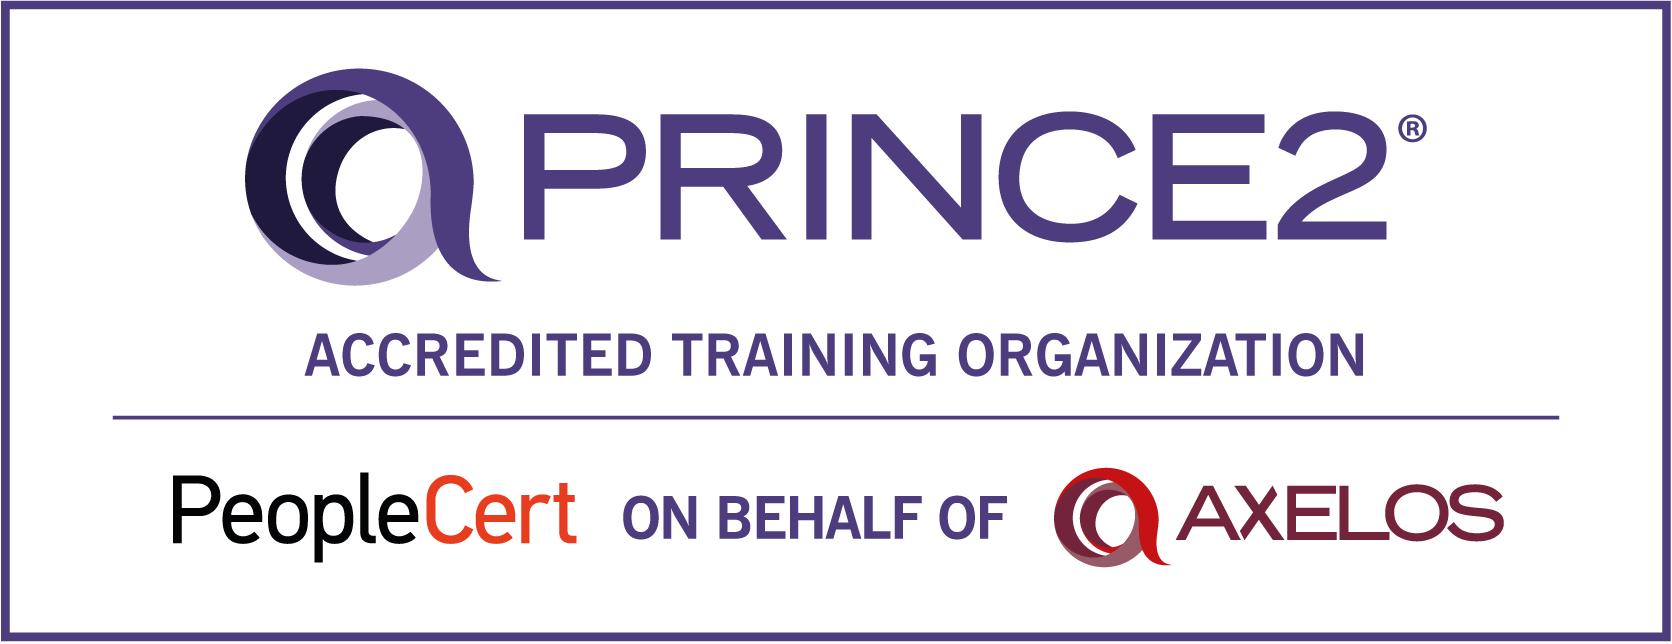 corso prince2 practitioner